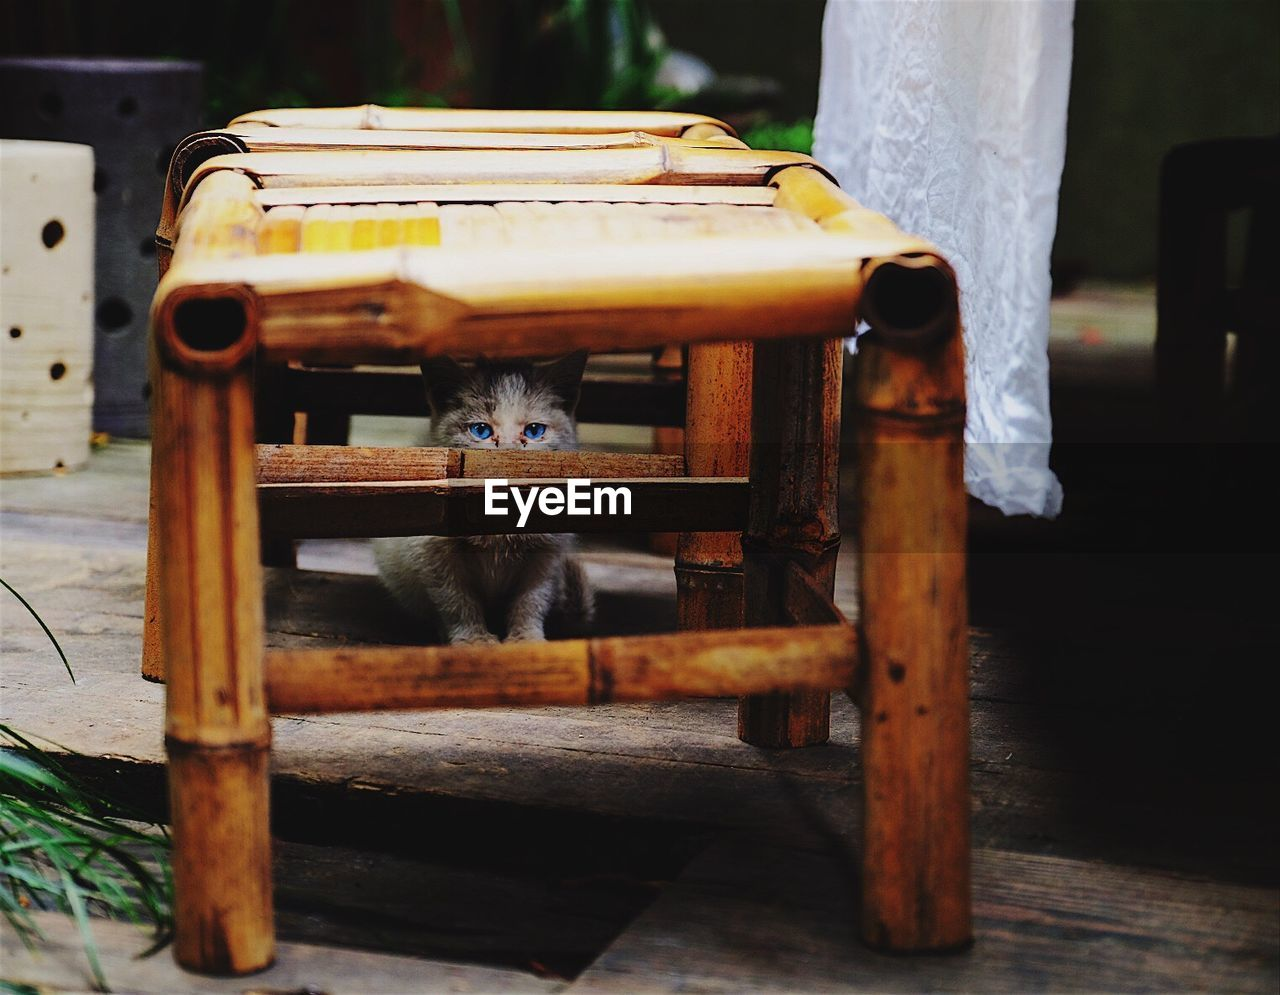 Portrait of cat sitting in stool